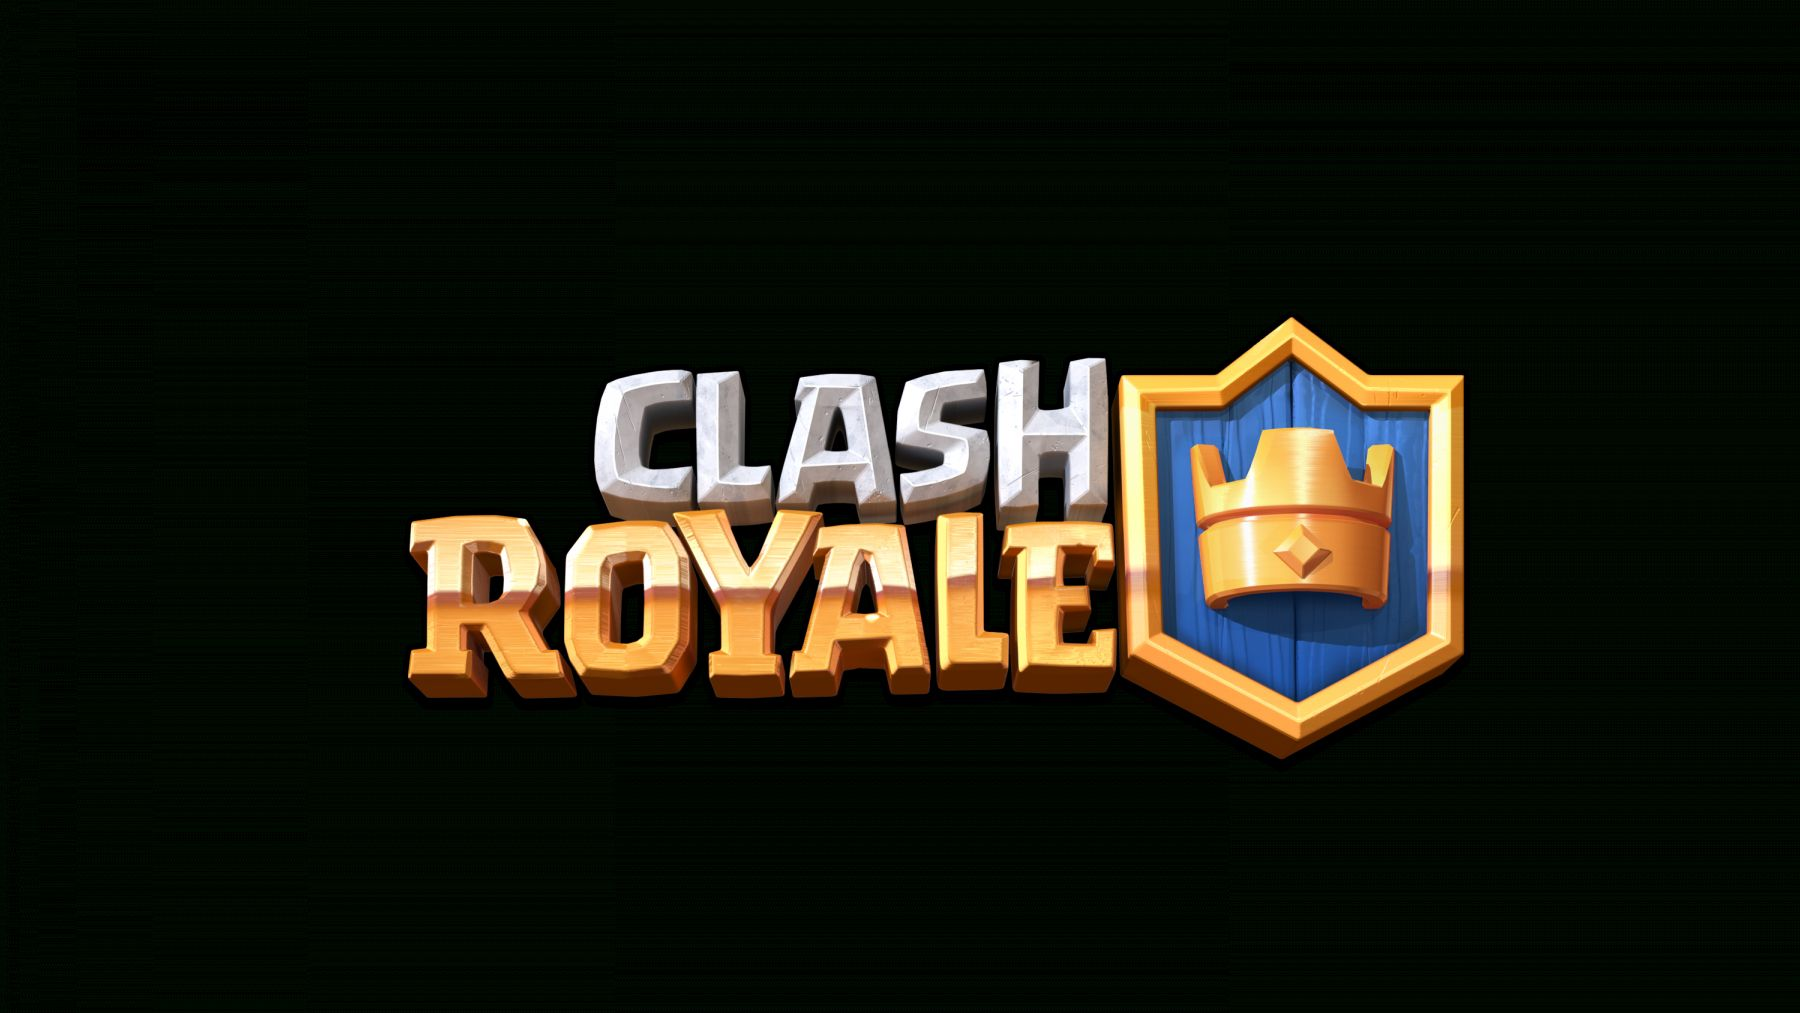 18 Clash Royale Logo Png Clash Royale Wallpaper Clash Royale Royal Logo